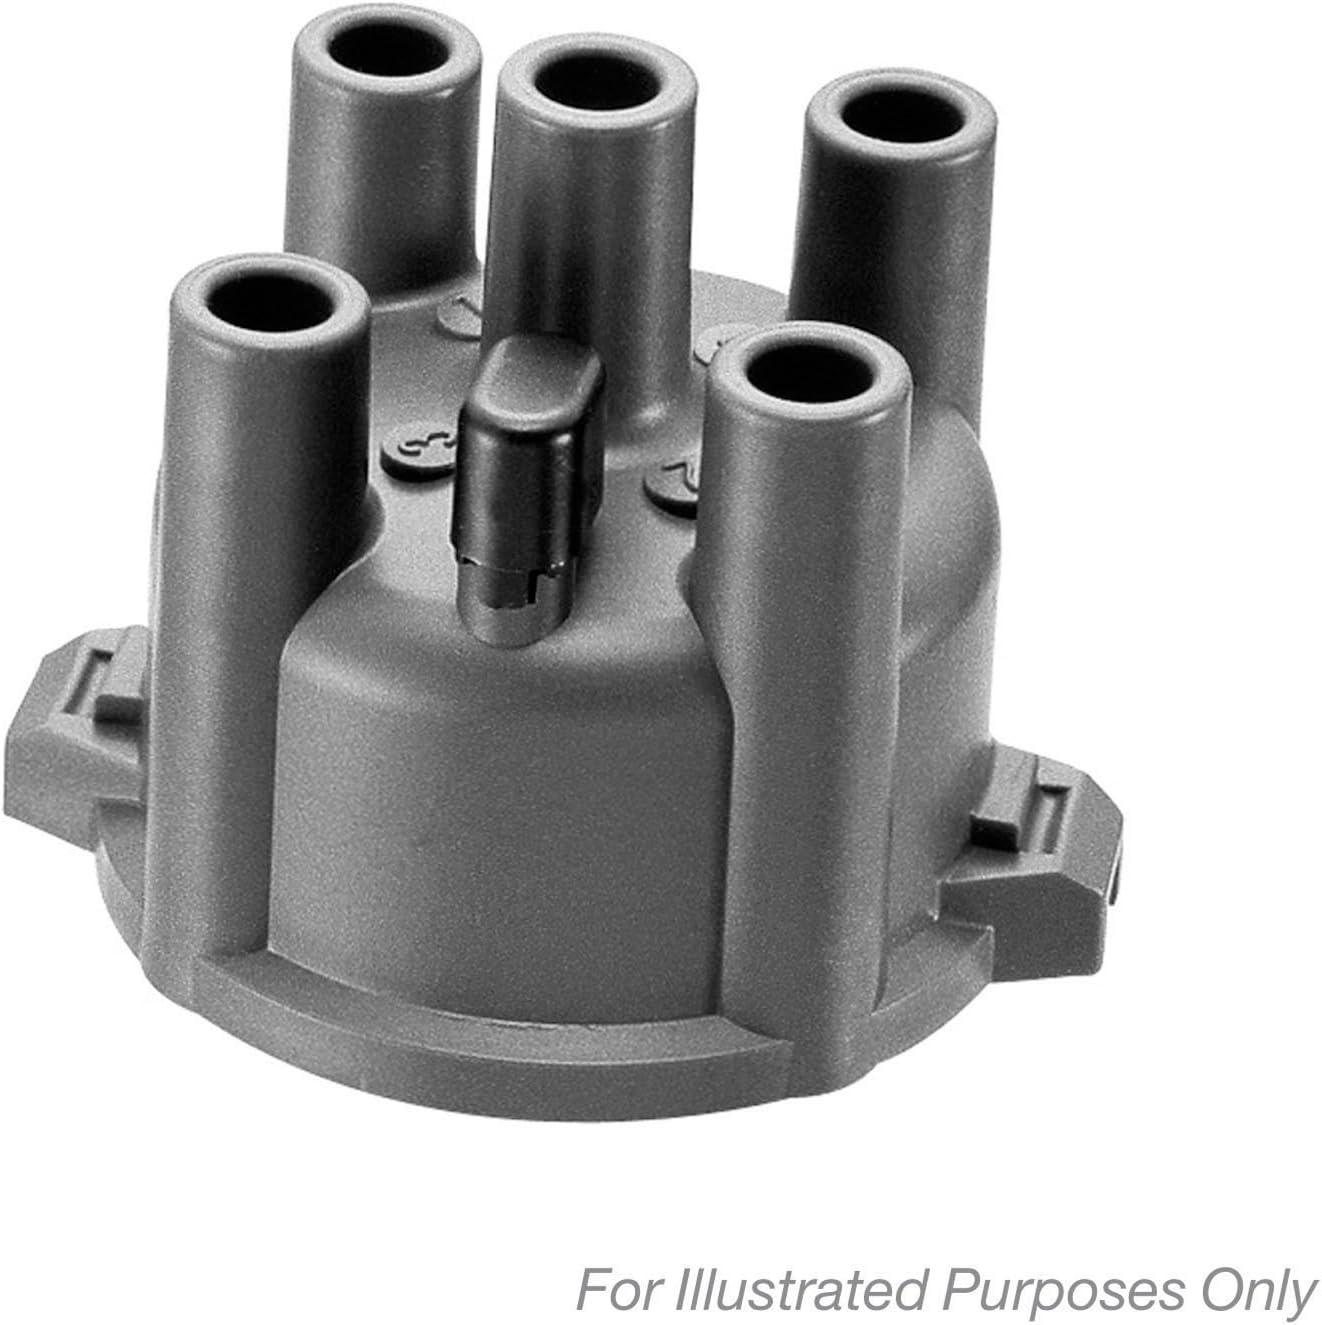 BOSCH Ignition Distributor Cap Fits MERCEDES W126 R107 C126 4.1-5.5L 1985